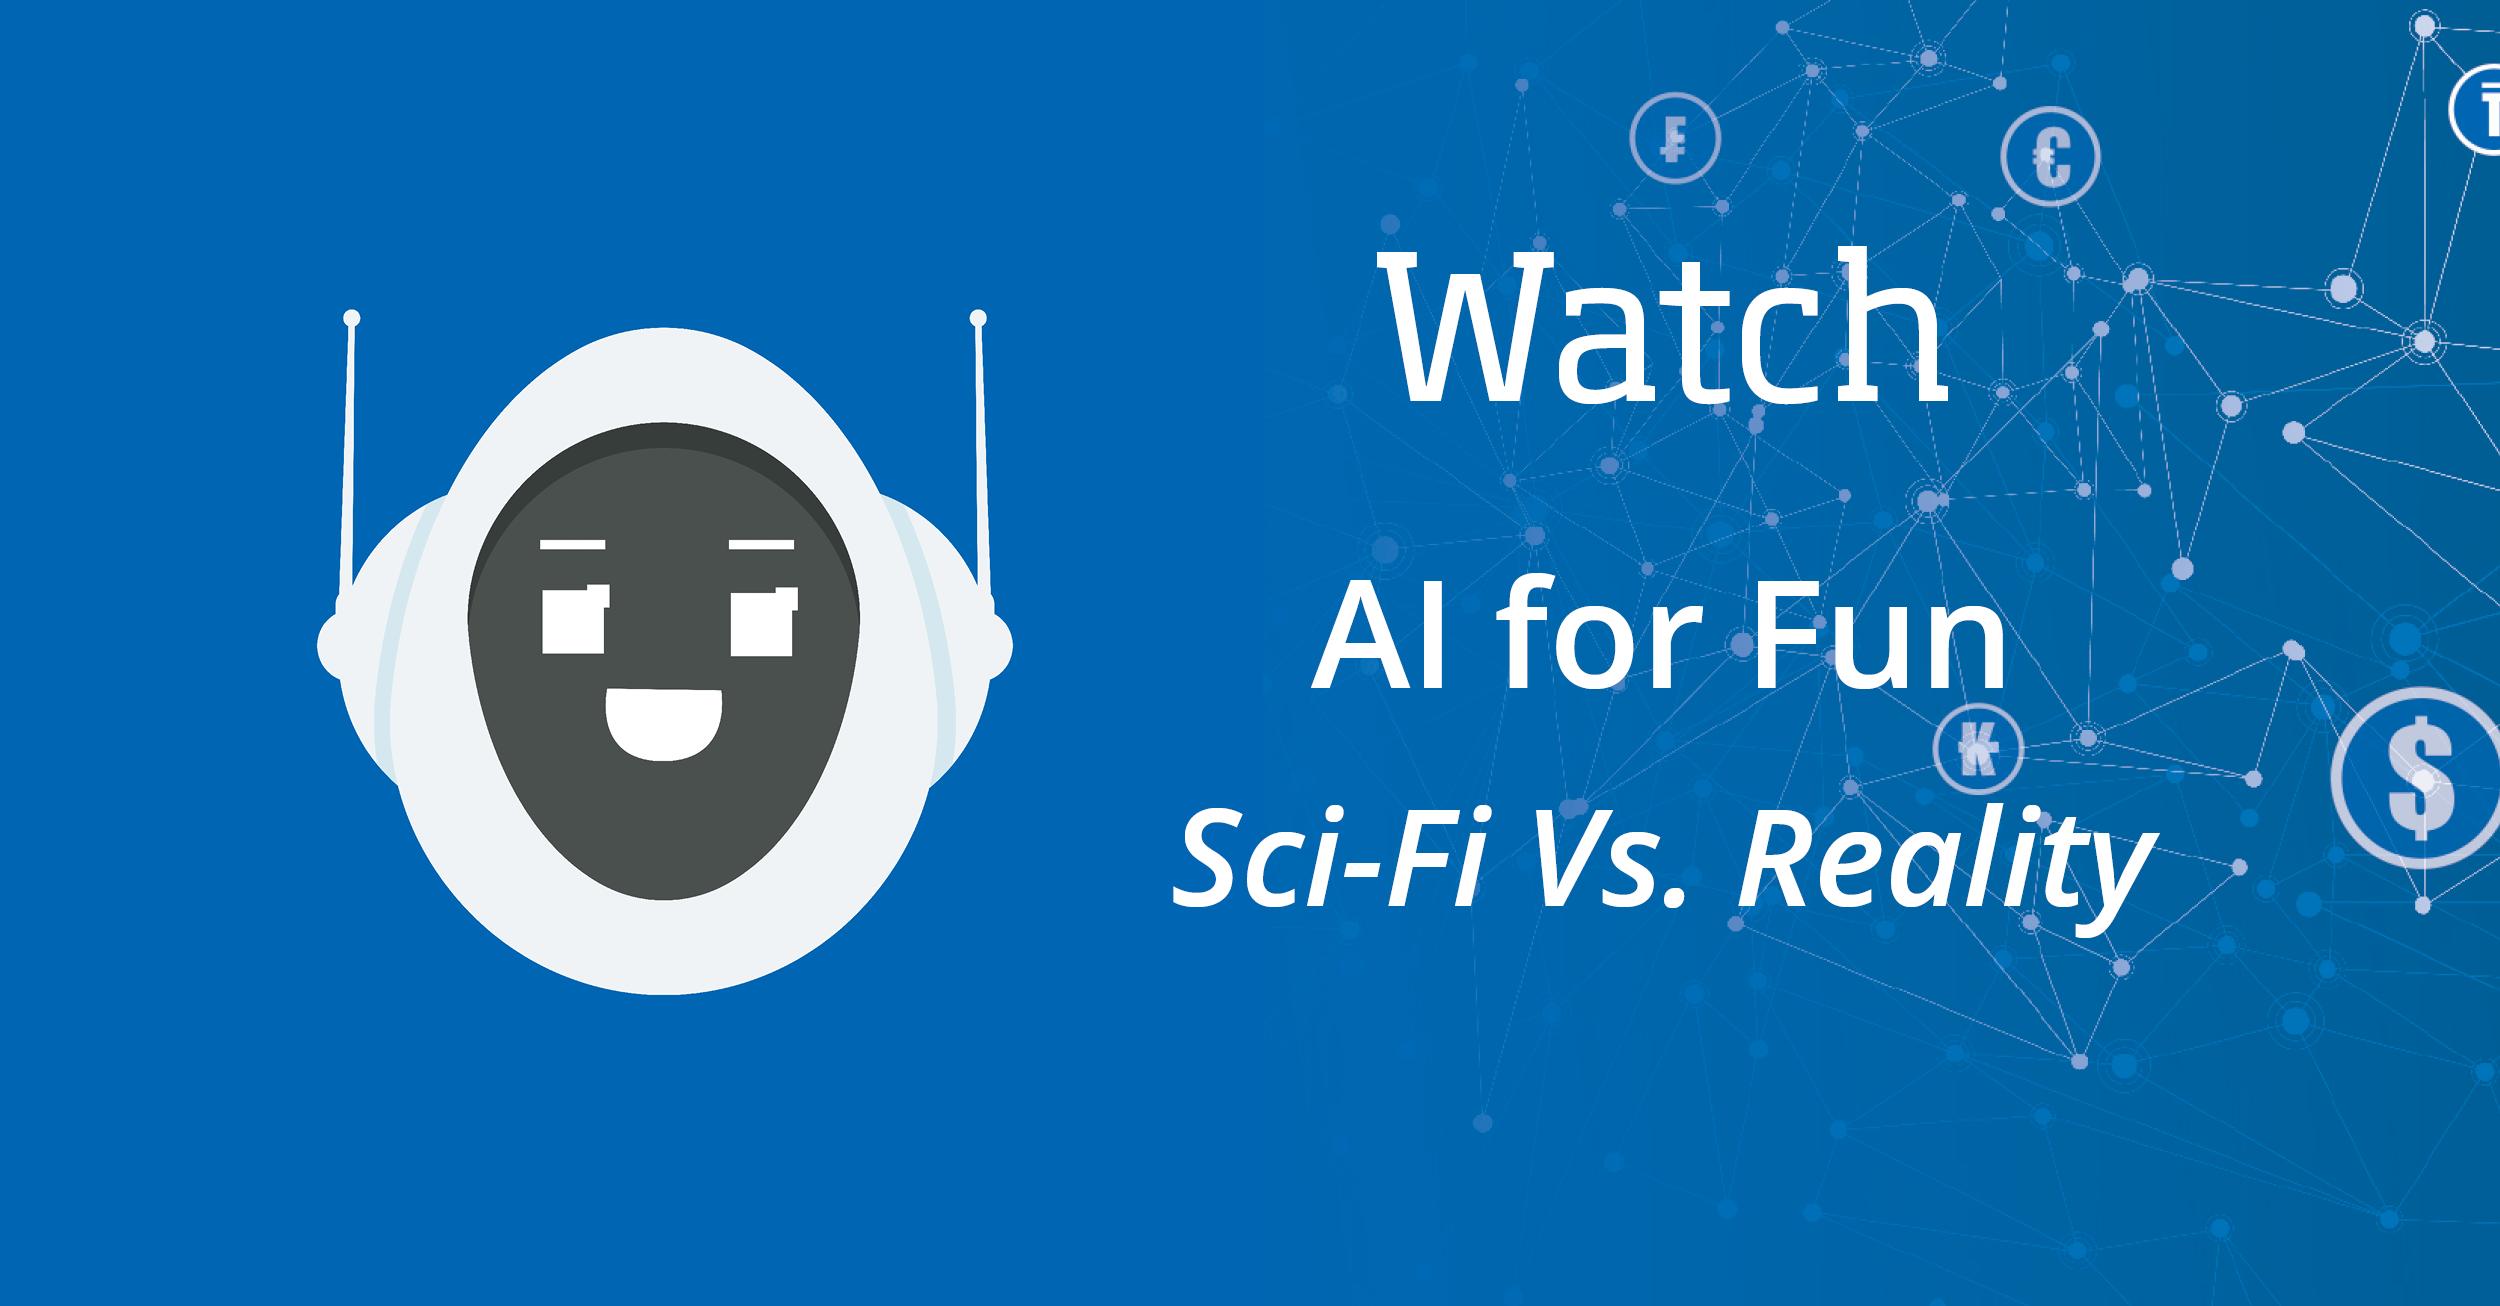 Webinar - AI Sci-Fi vs. Reality-20200723 1902-1